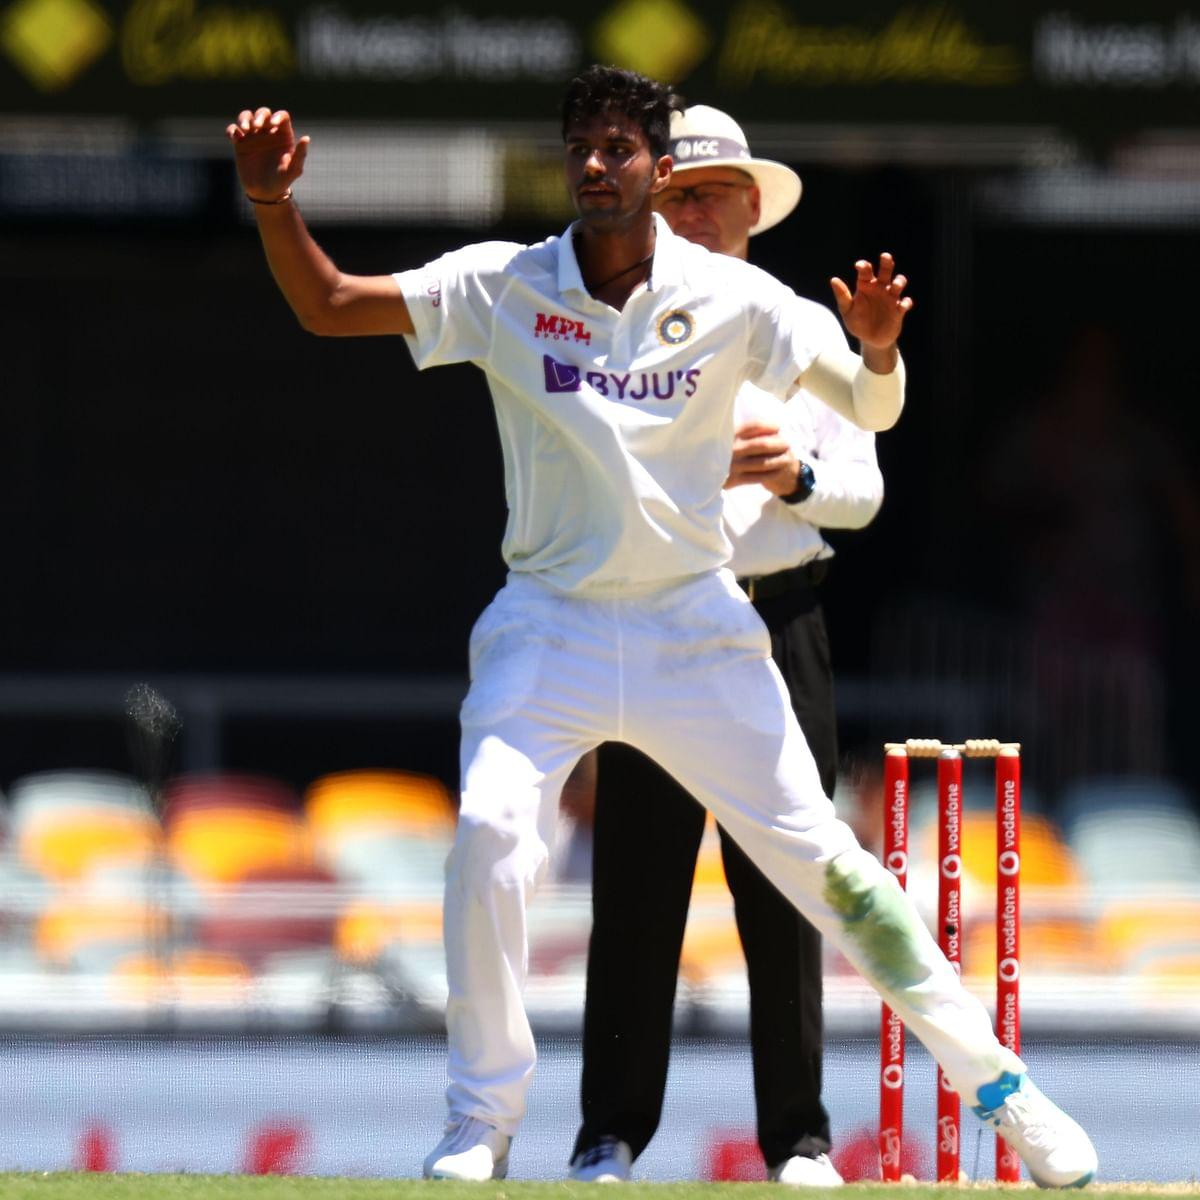 India vs Australia, 4th Test: Sundar gets Smith but Labuschagne takes Australia to 154/3 at tea